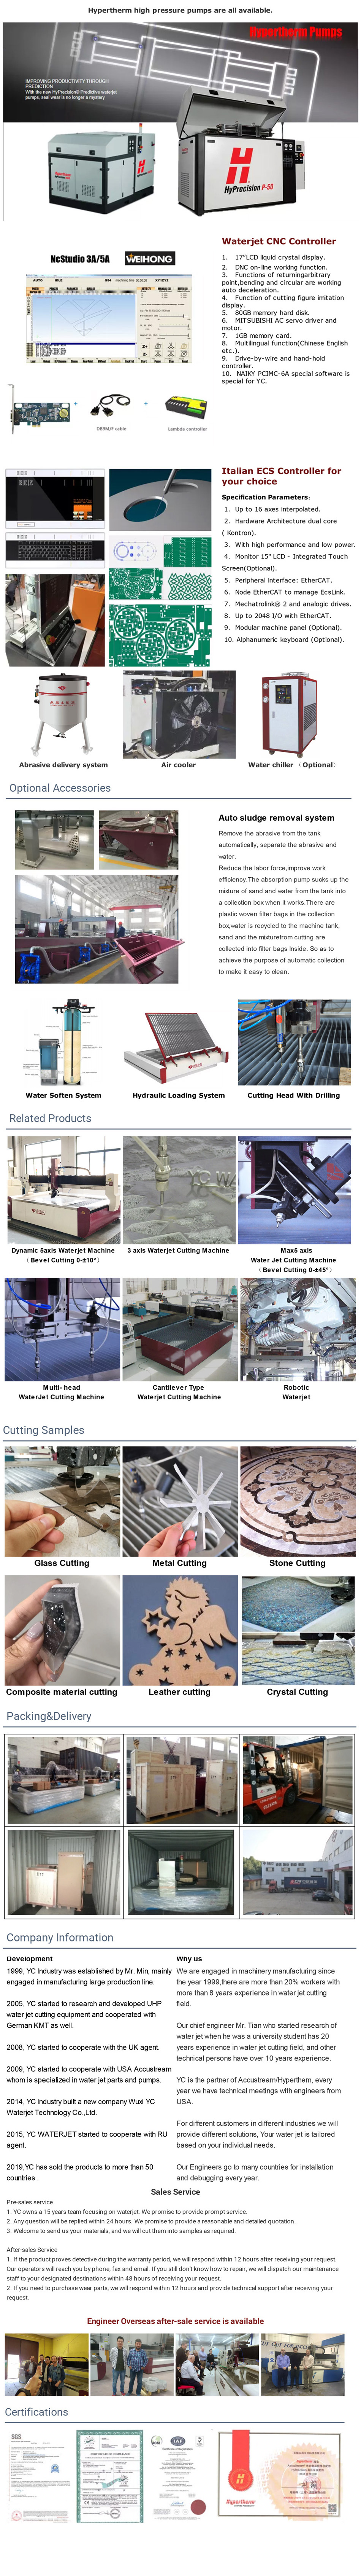 5 axis 3D waterjet cutting machine